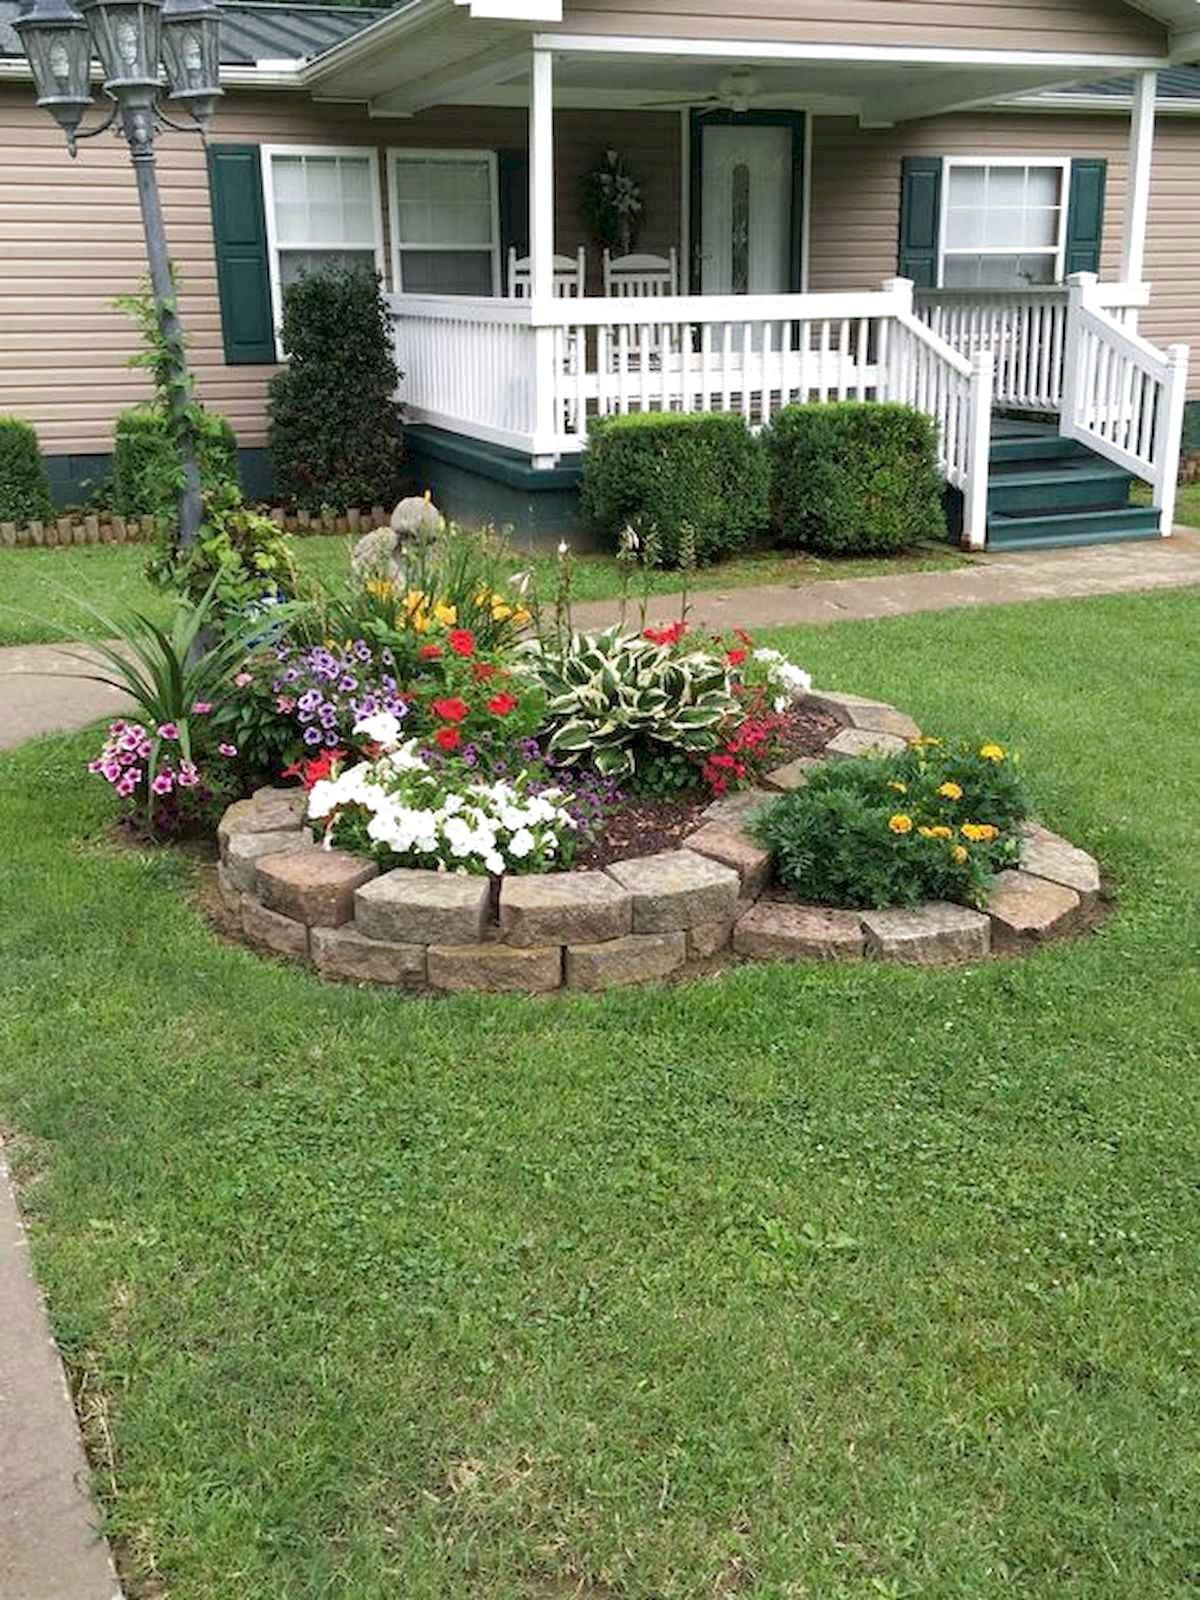 44 Beautiful Front Yard Garden Landscaping Design Ideas And Remodel Blomsterkrukker Fro Urt